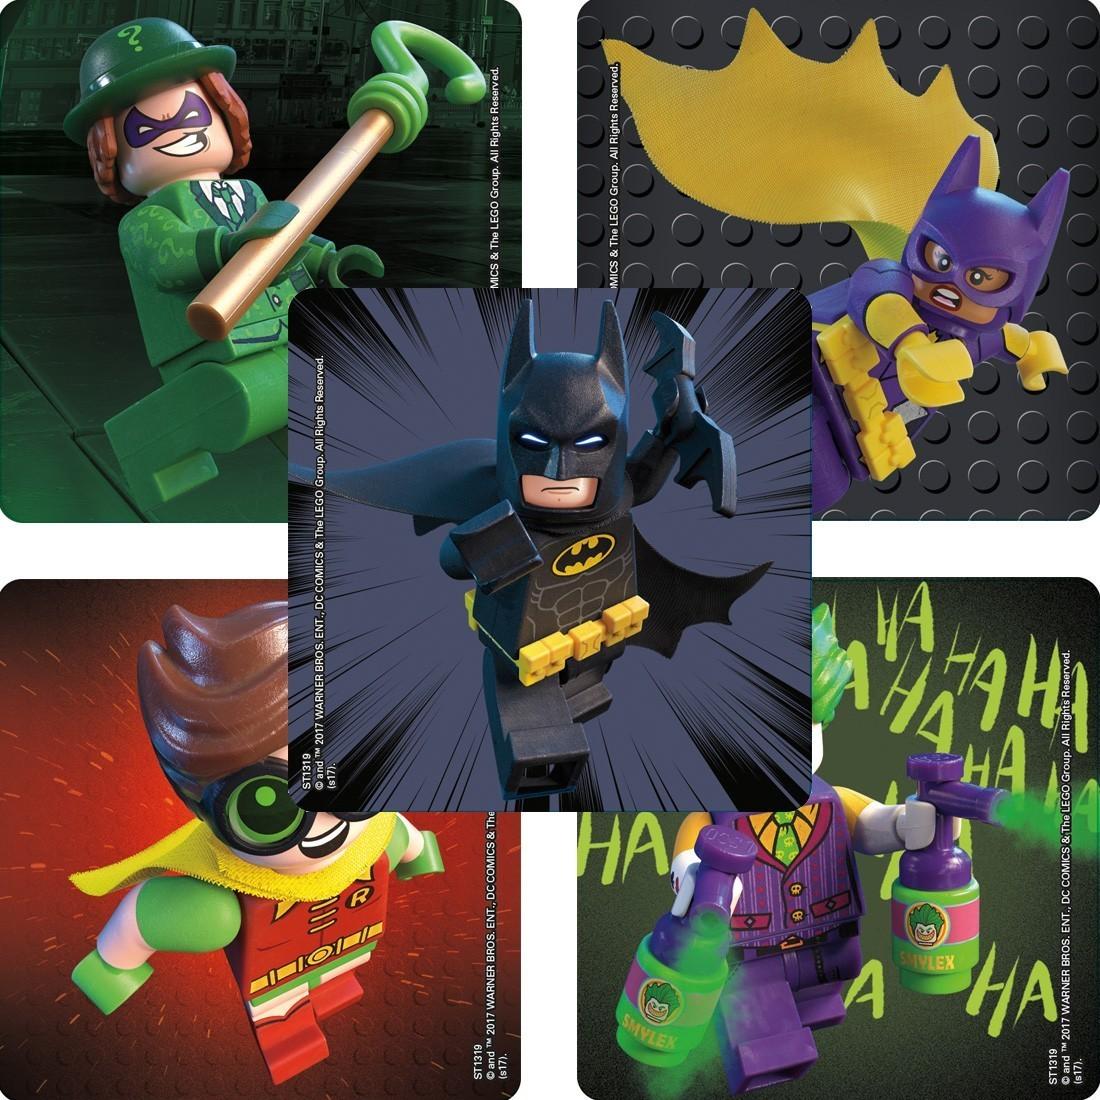 Lego Batman Movie Stickers [image]